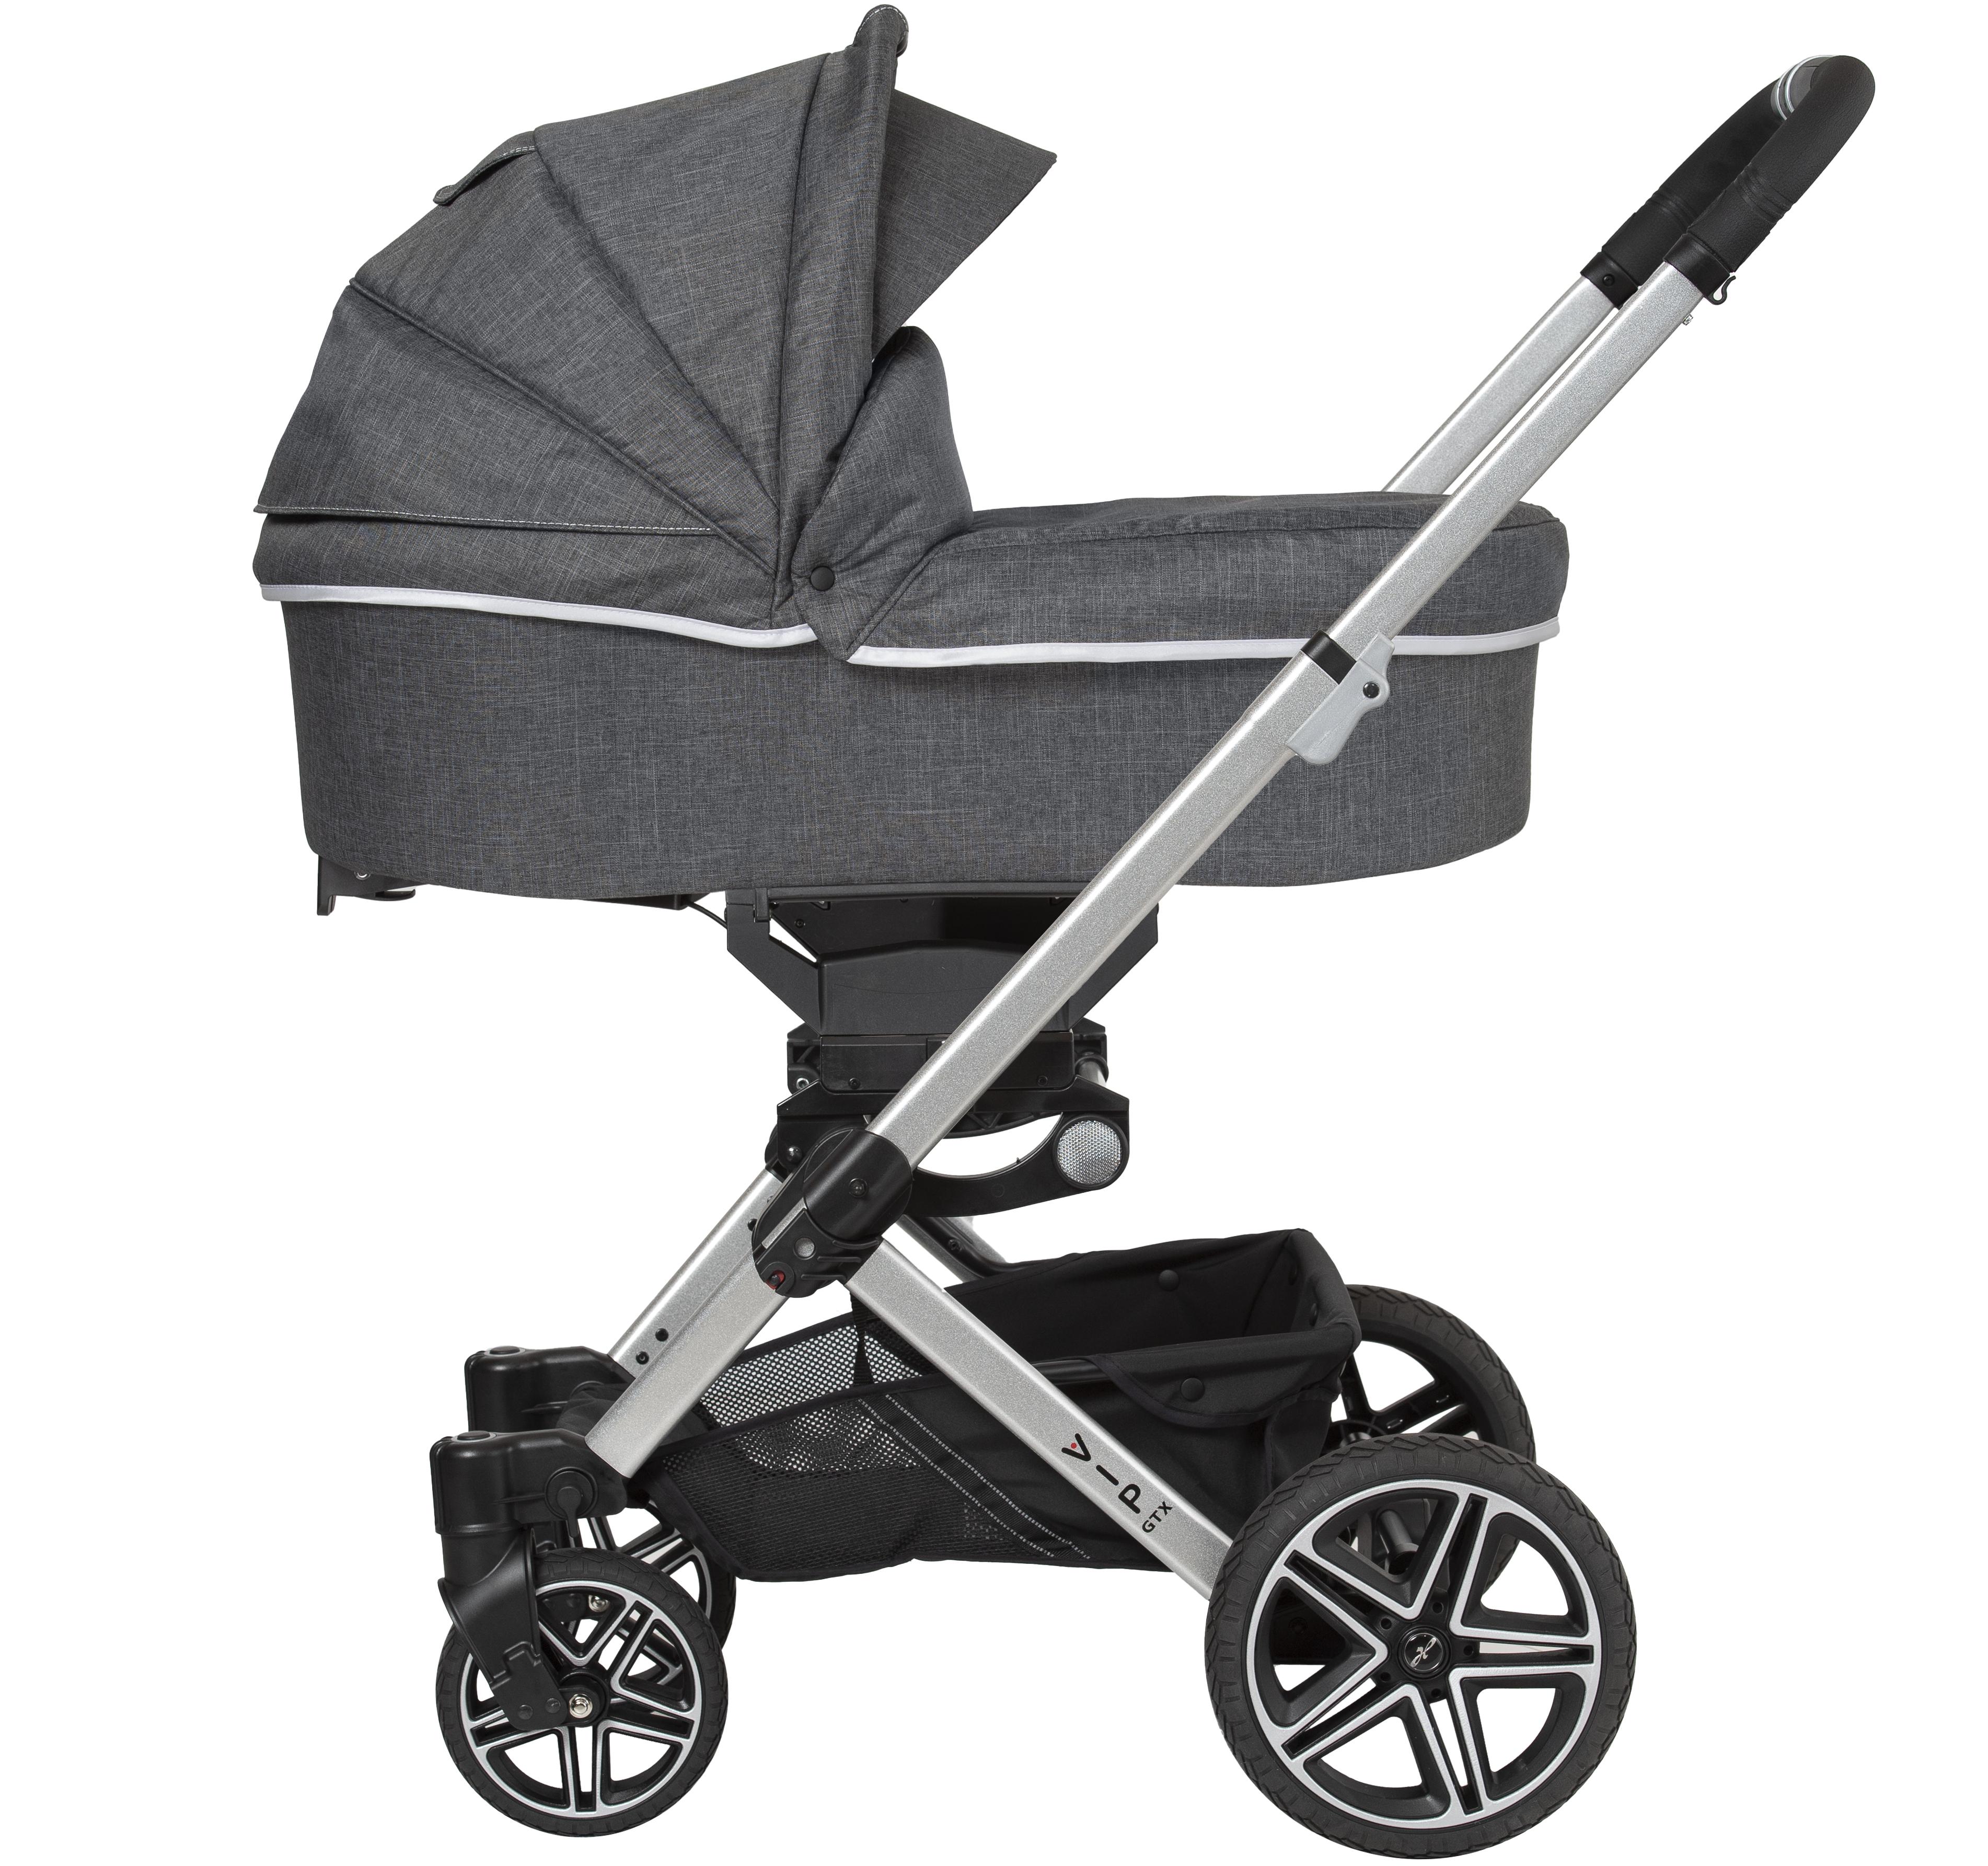 HARTAN Vip GTX (2021) Kombi-Kinderwagen